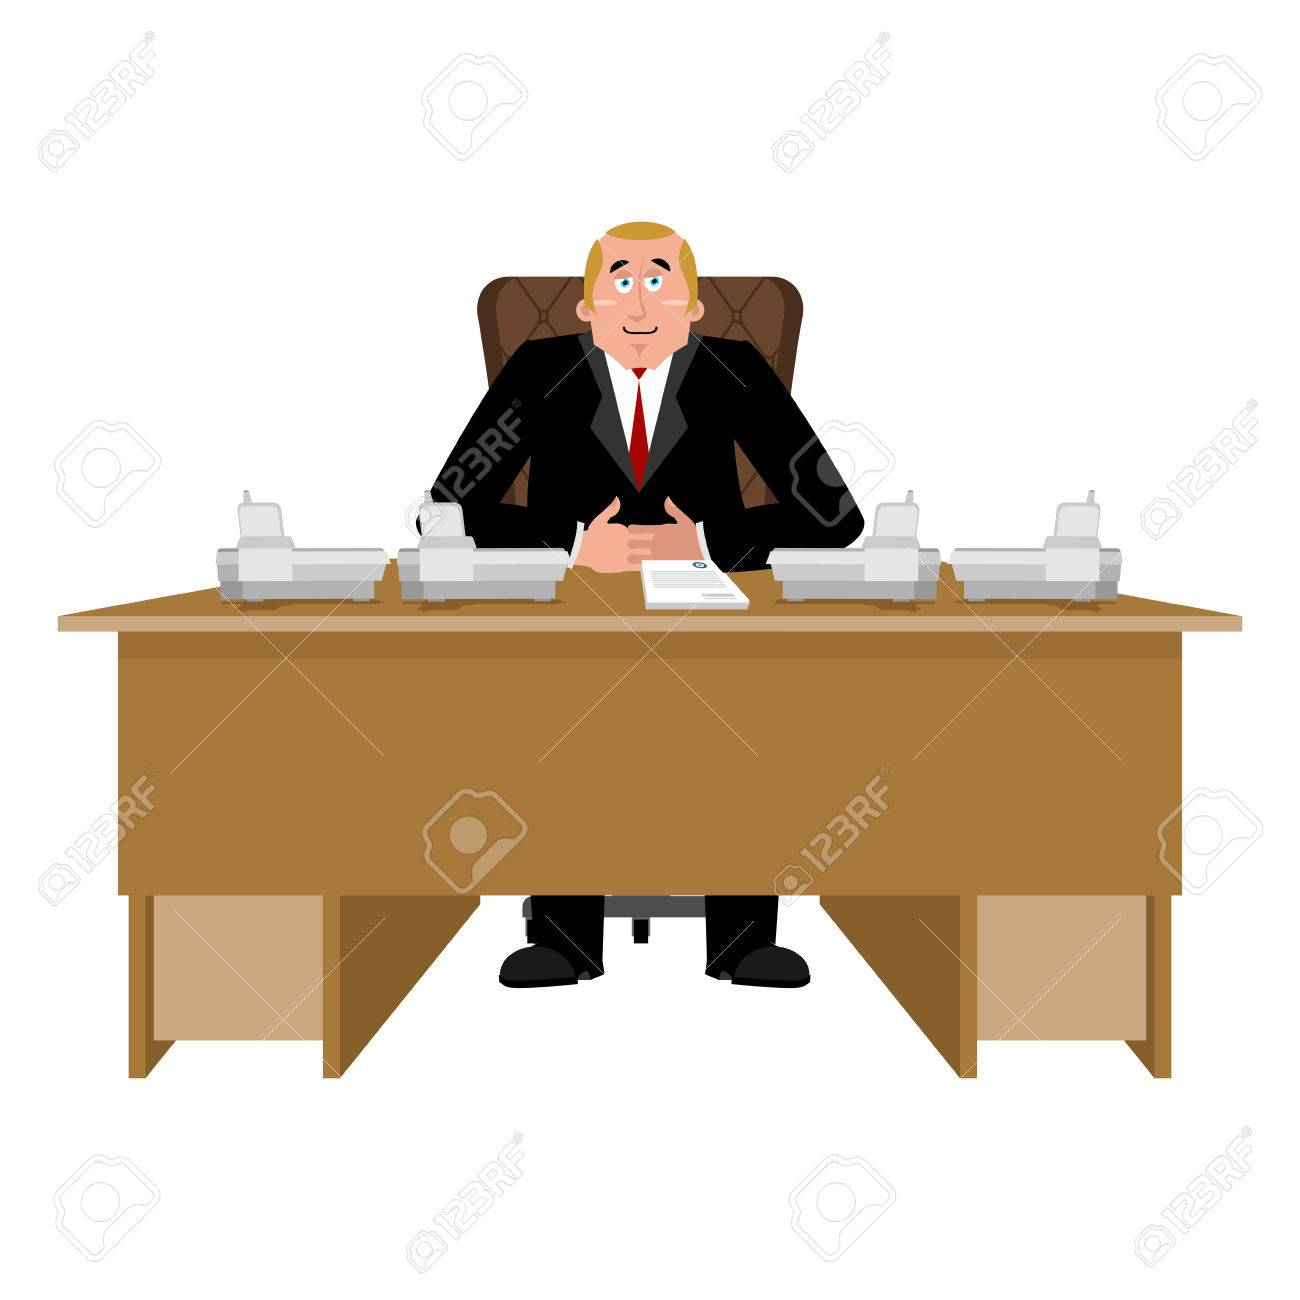 boss tableoffice deskexecutive deskmanager. President At Desk. Big Boss Table. Director In Office. Chief Worker Room Tableoffice Deskexecutive Deskmanager